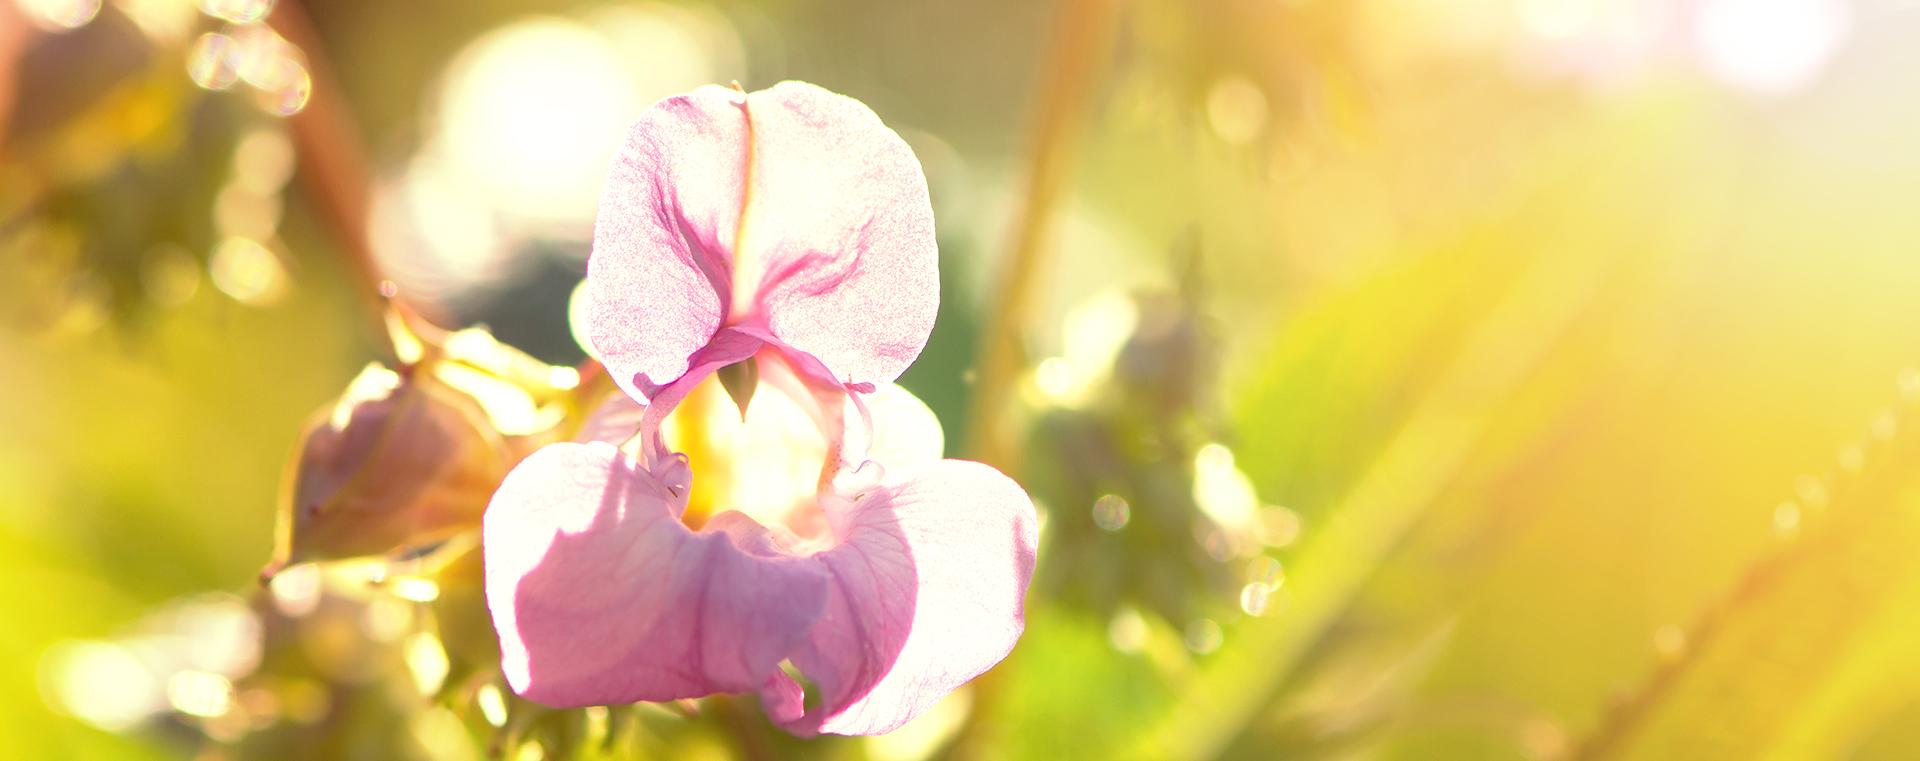 Impatiens Springkraut Einsamkeit Lemon Pharma Original Bachblüten